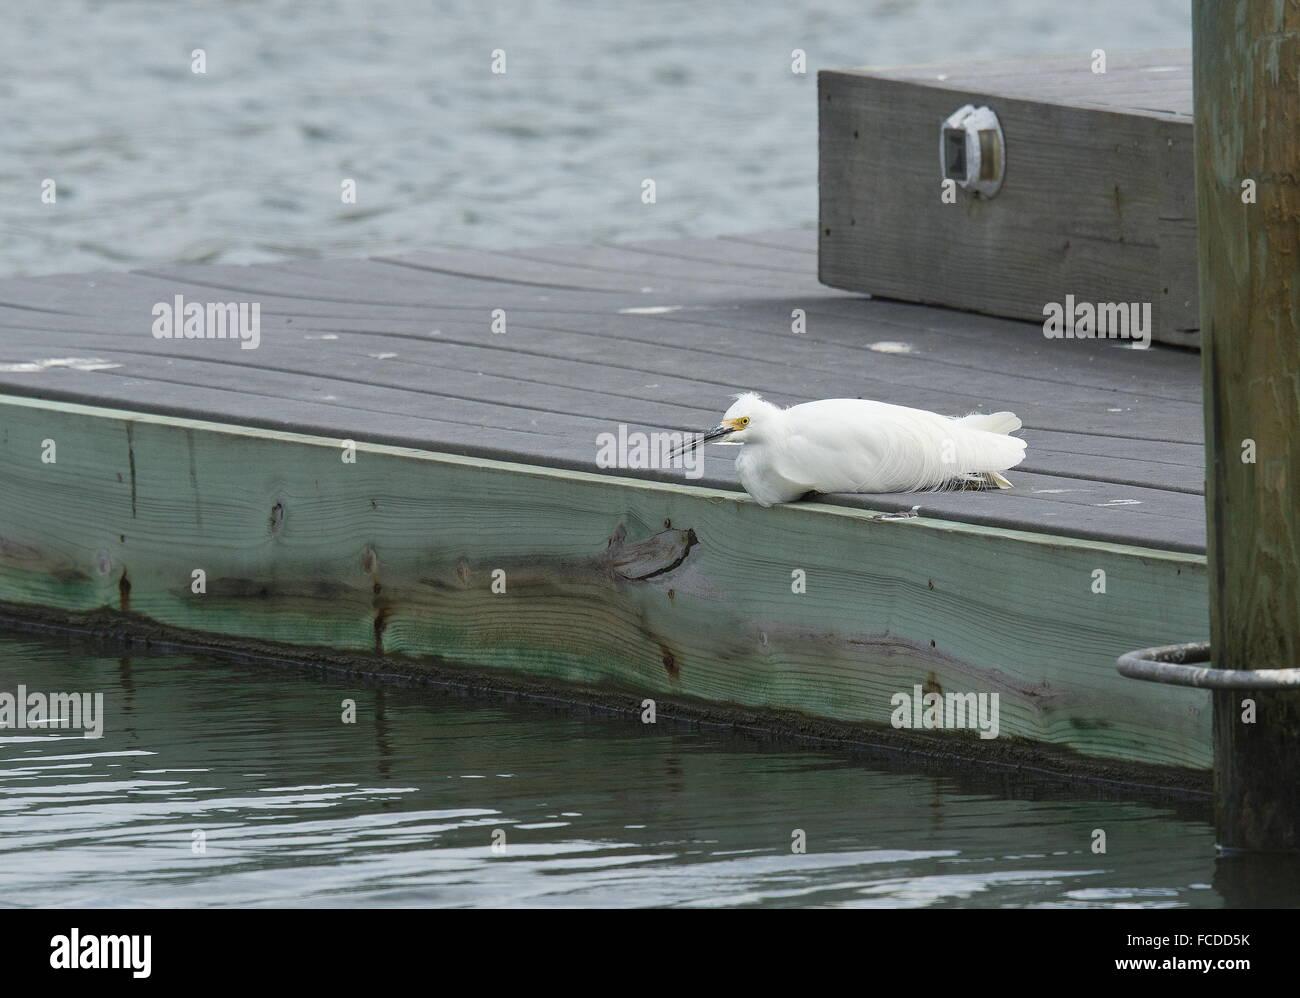 Snowy Egret, Egretta thula, lying down on jetty; Texas - Stock Image